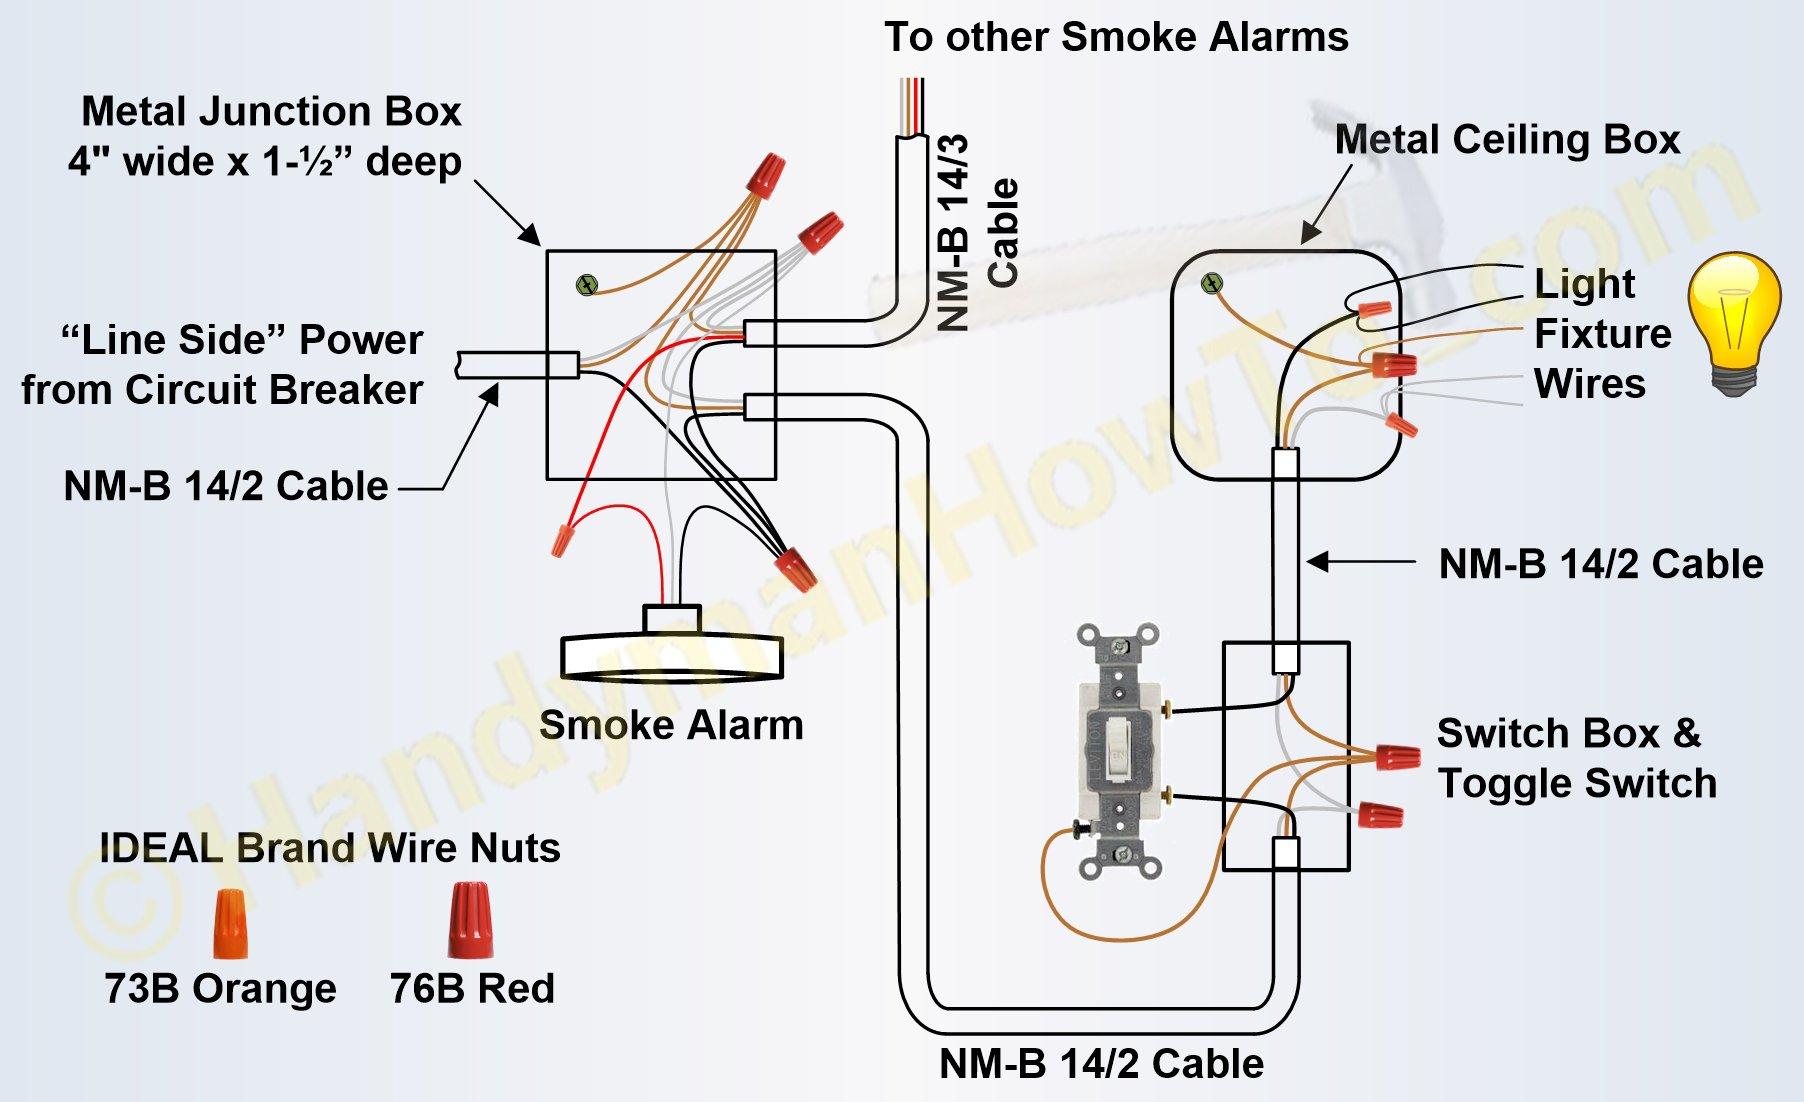 Fire Alarm Installation Wiring Diagram from annawiringdiagram.com